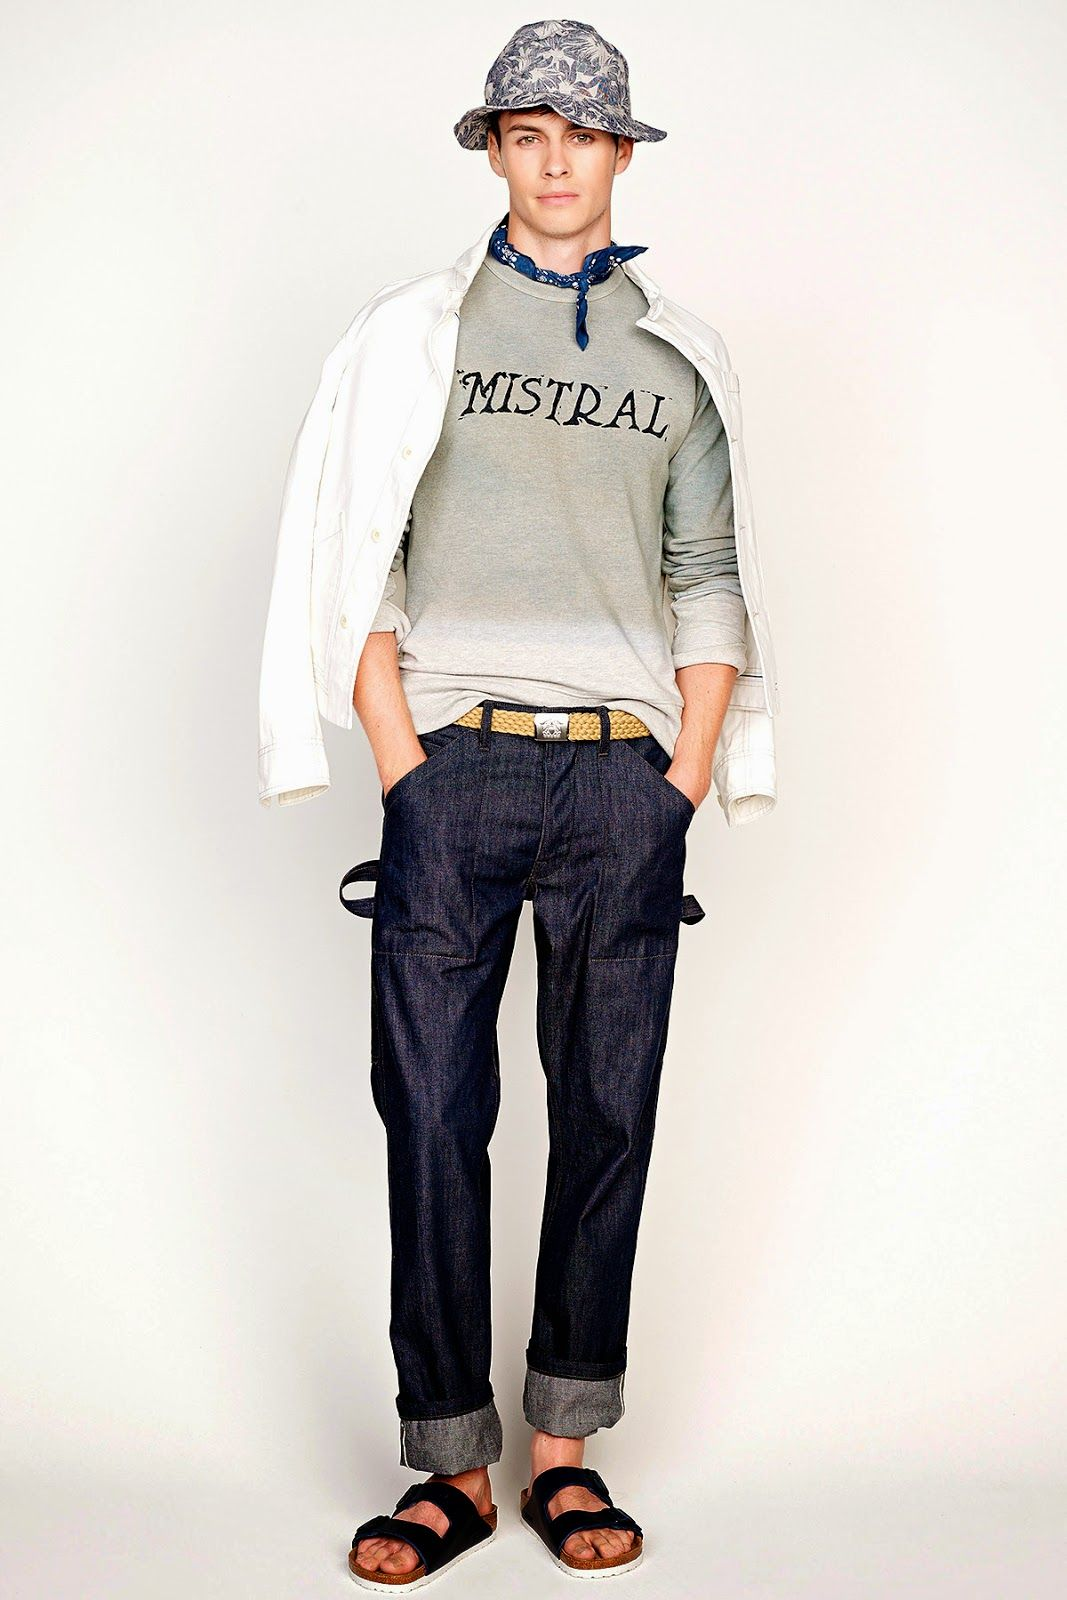 http://melonylemon.blogspot.com.es/2015/01/jcrew-by-nueva-york-fashion-week-ss2015.html